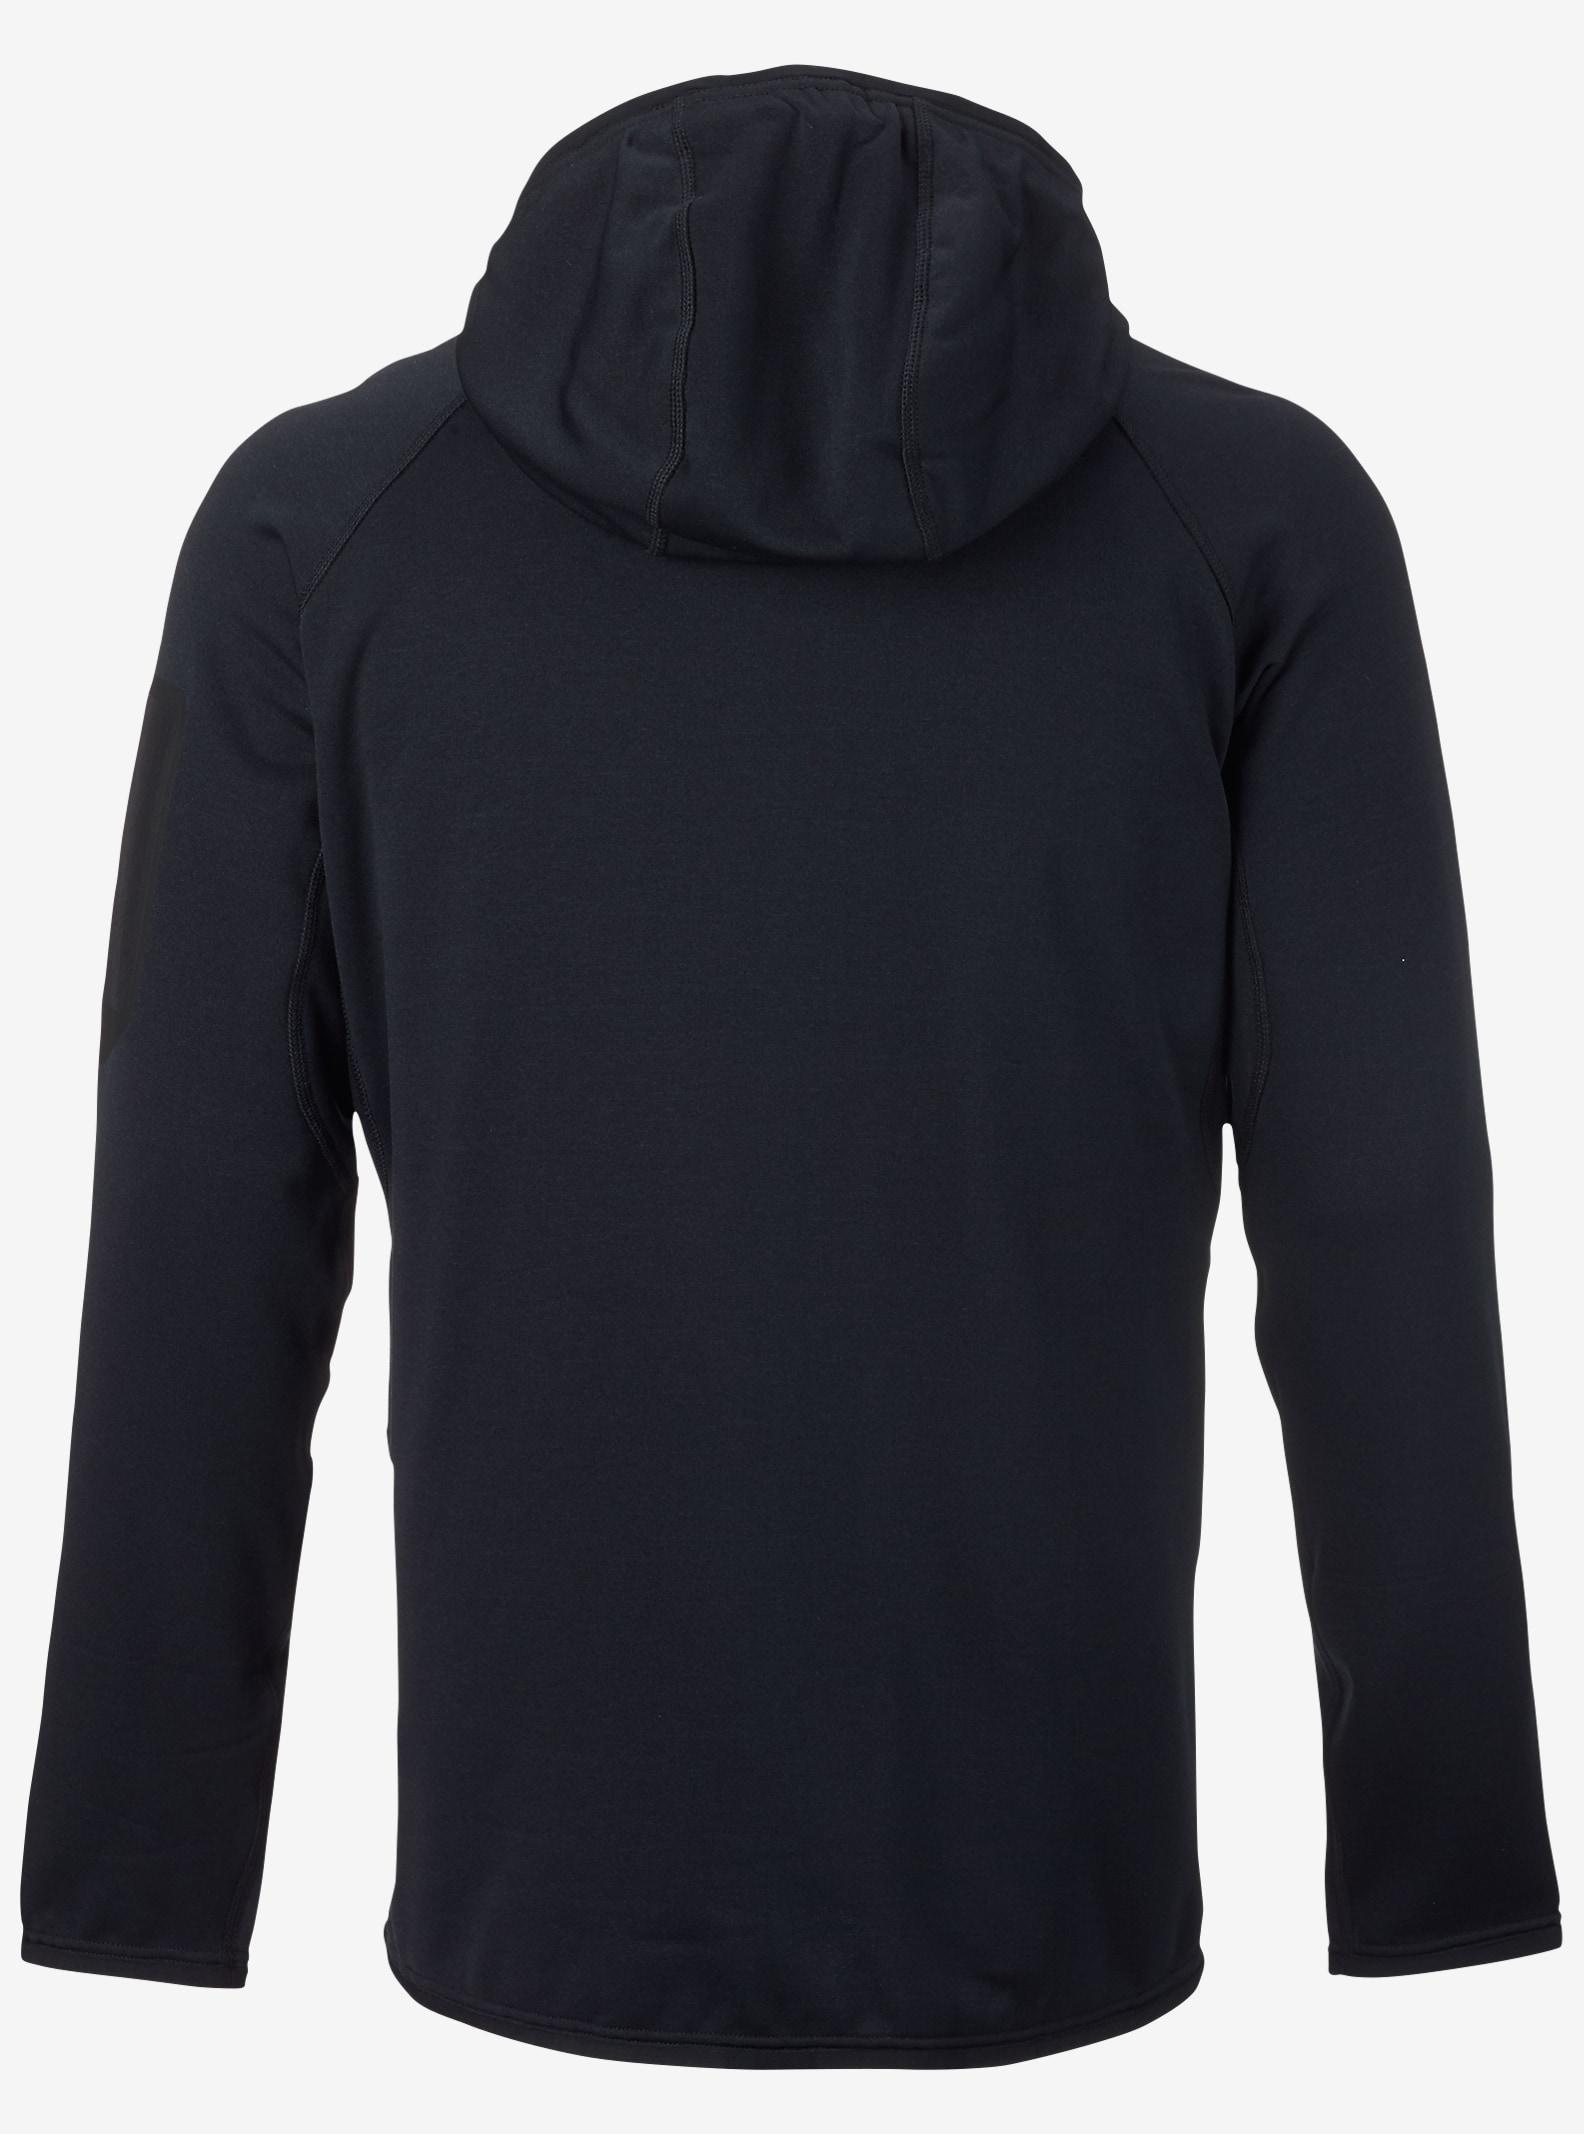 Burton [ak] Piston Hoodie shown in True Black